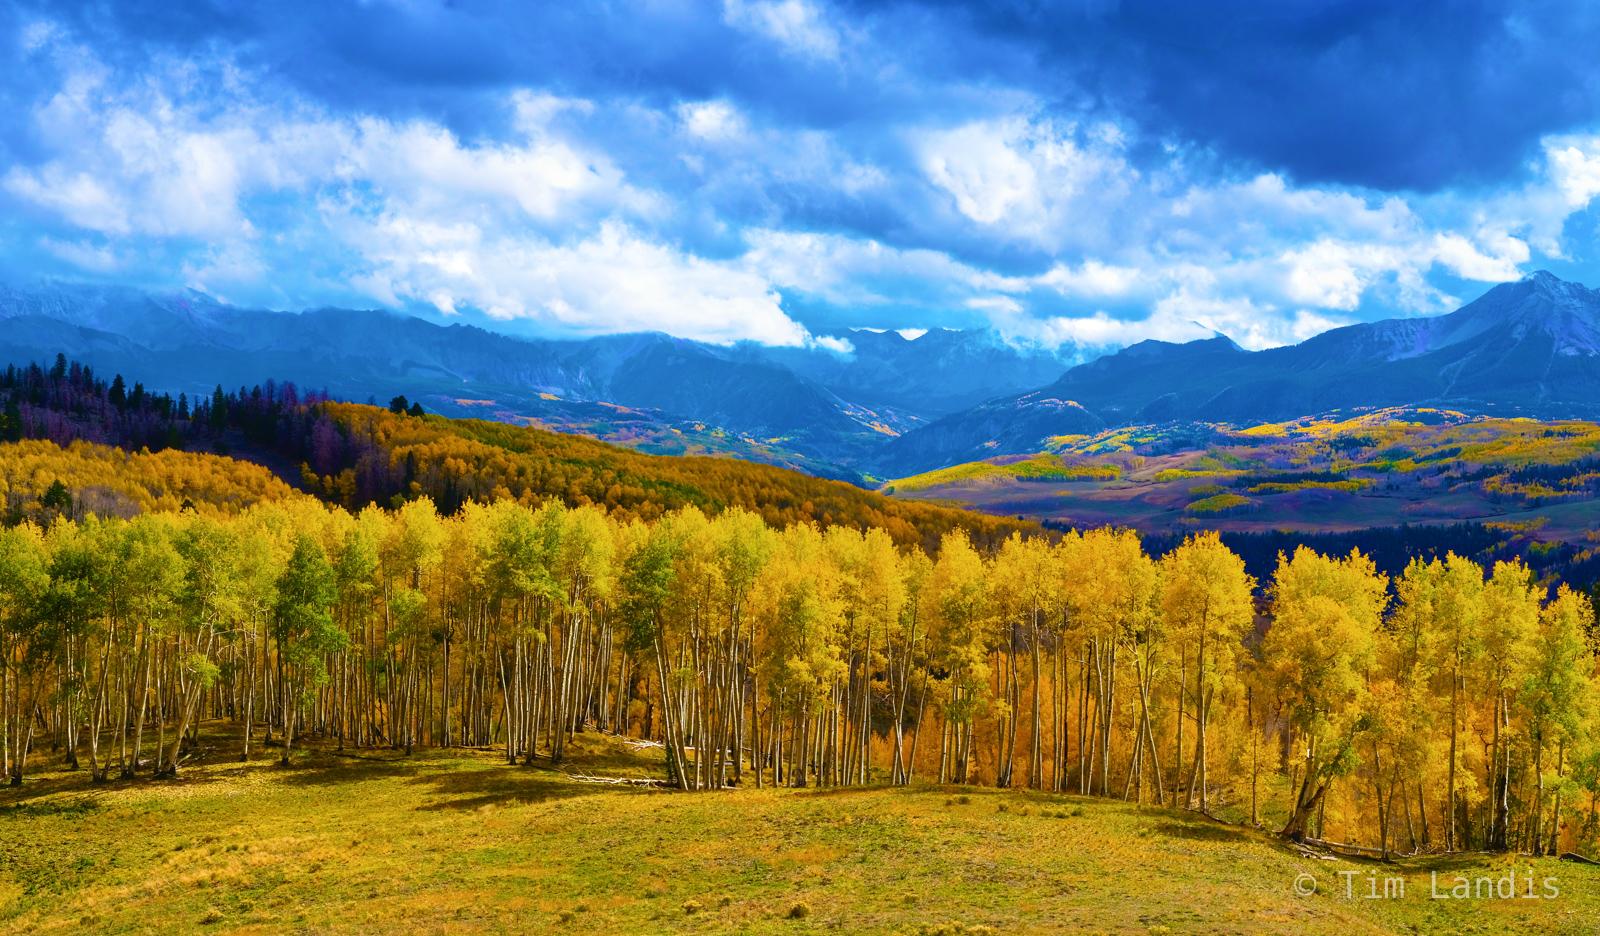 Aspen, aspens, colorado, meadow with aspens, telluride, photo